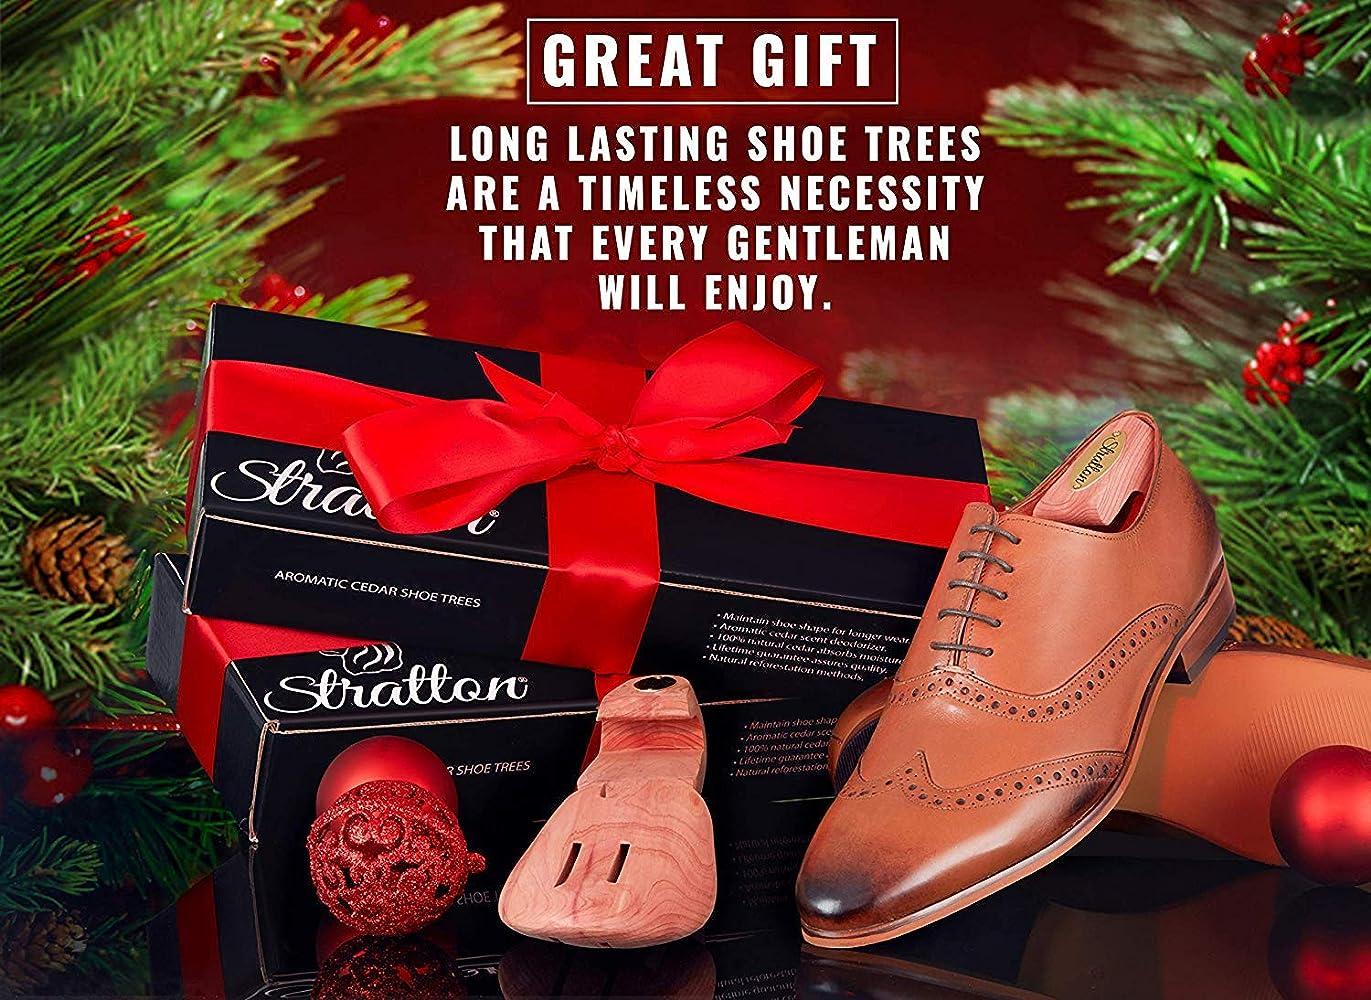 Cedar Shoe Trees for Men 2-Pack USA Red Aromatic Cedar Wood Shoe Trees